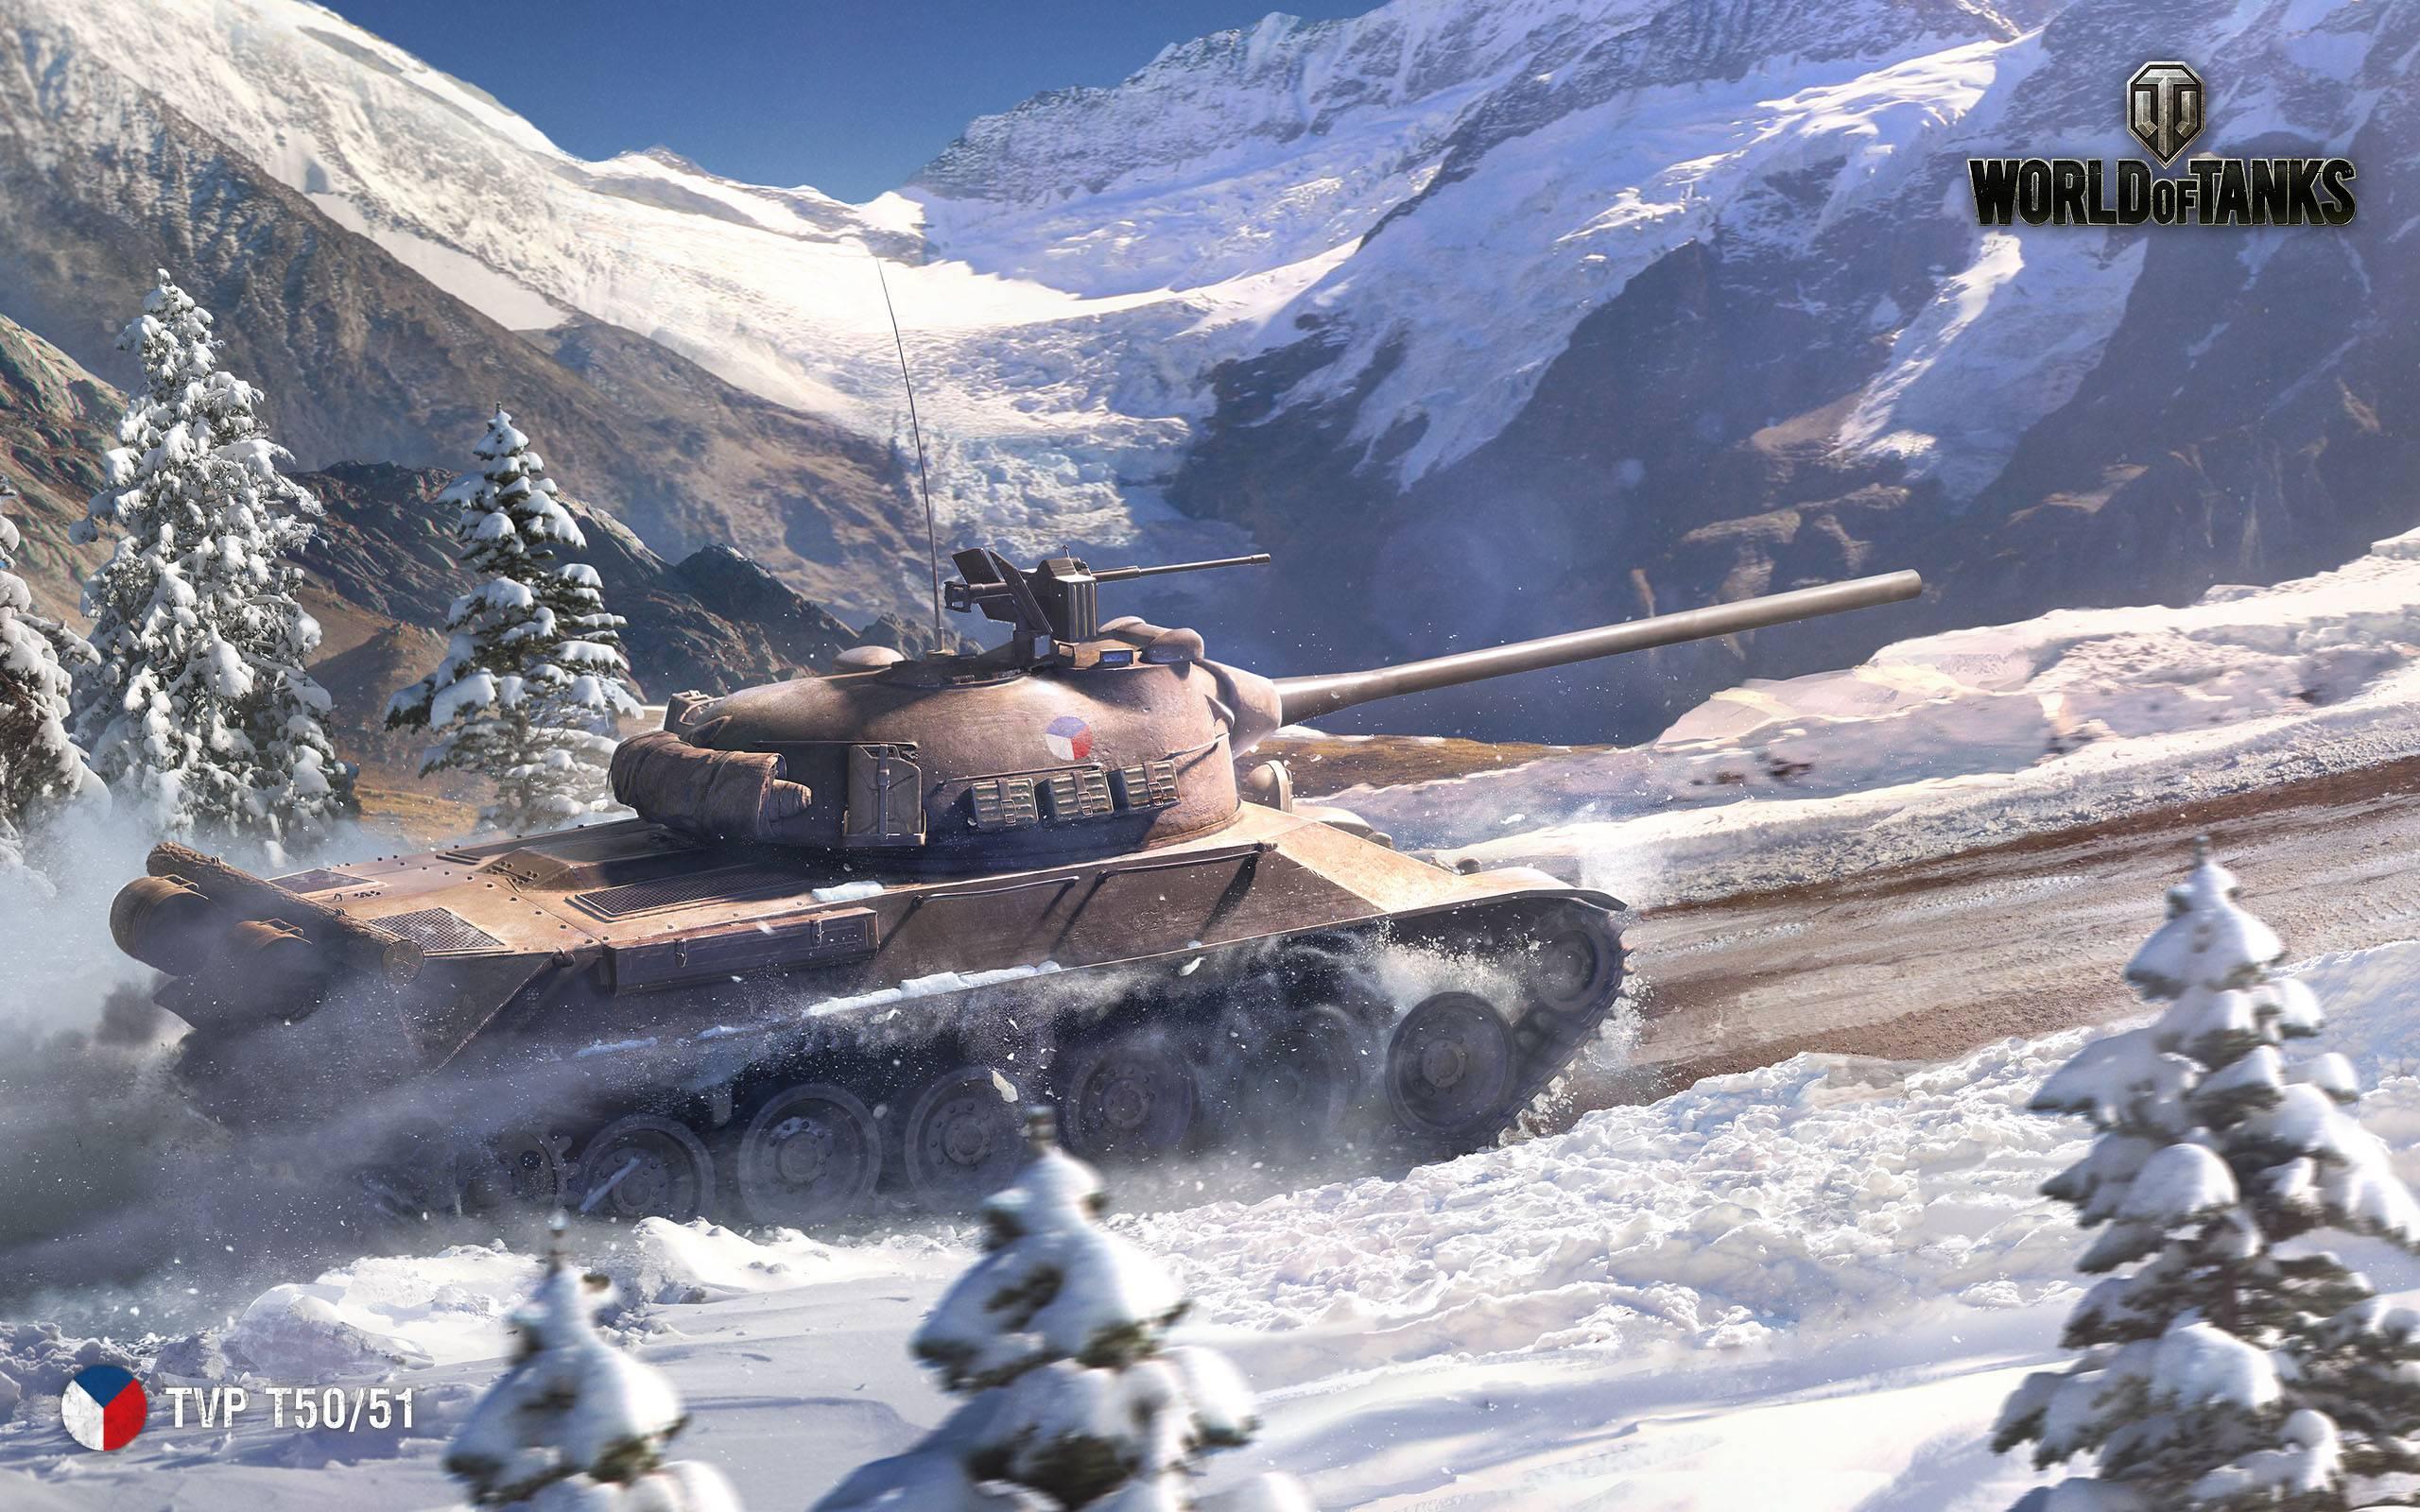 обои С новым годом, world of tanks картинки фото